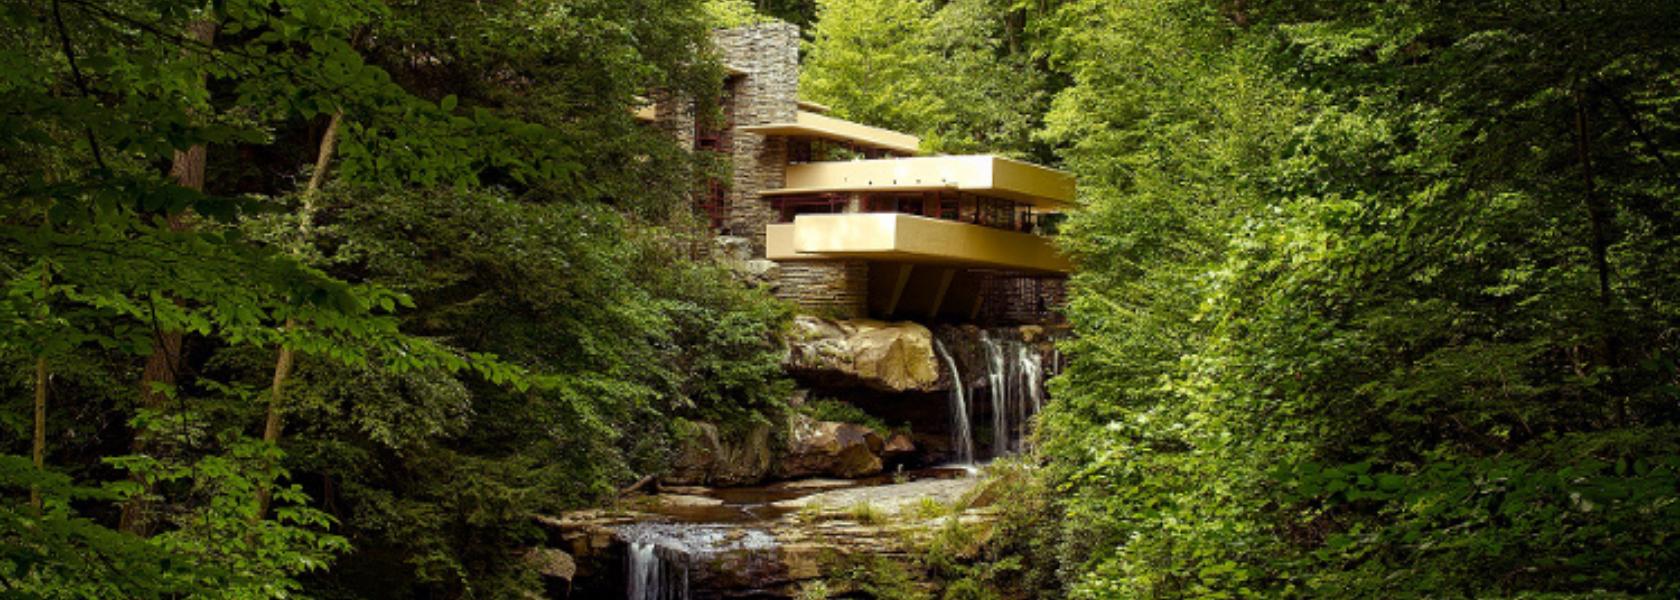 Fallingwater, le chef d'œuvre de Frank Lloyd Wright - Oikos